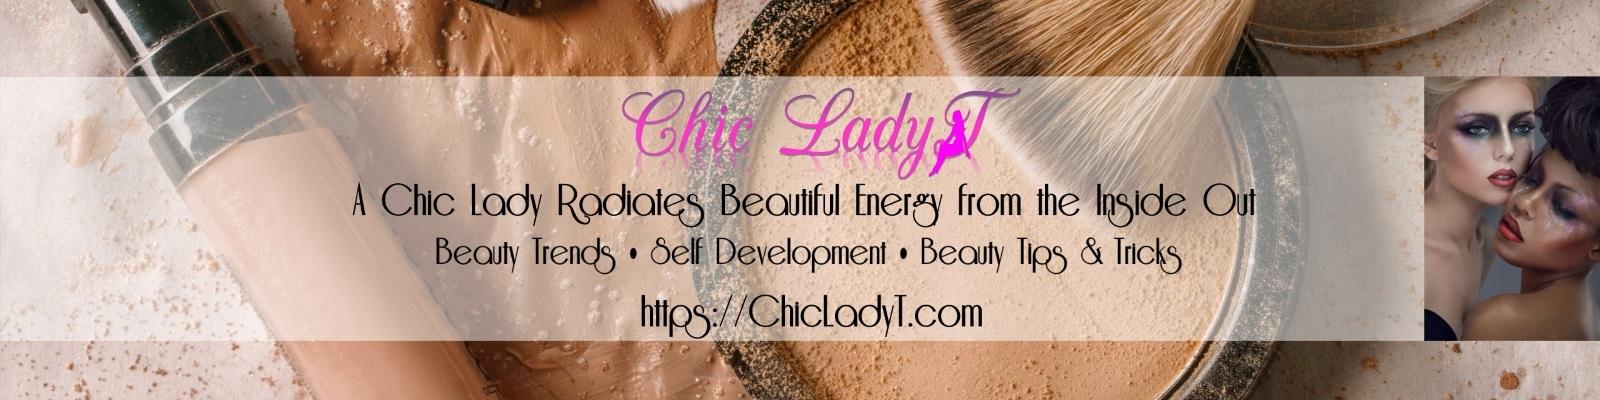 Chic LadyT Merch Store